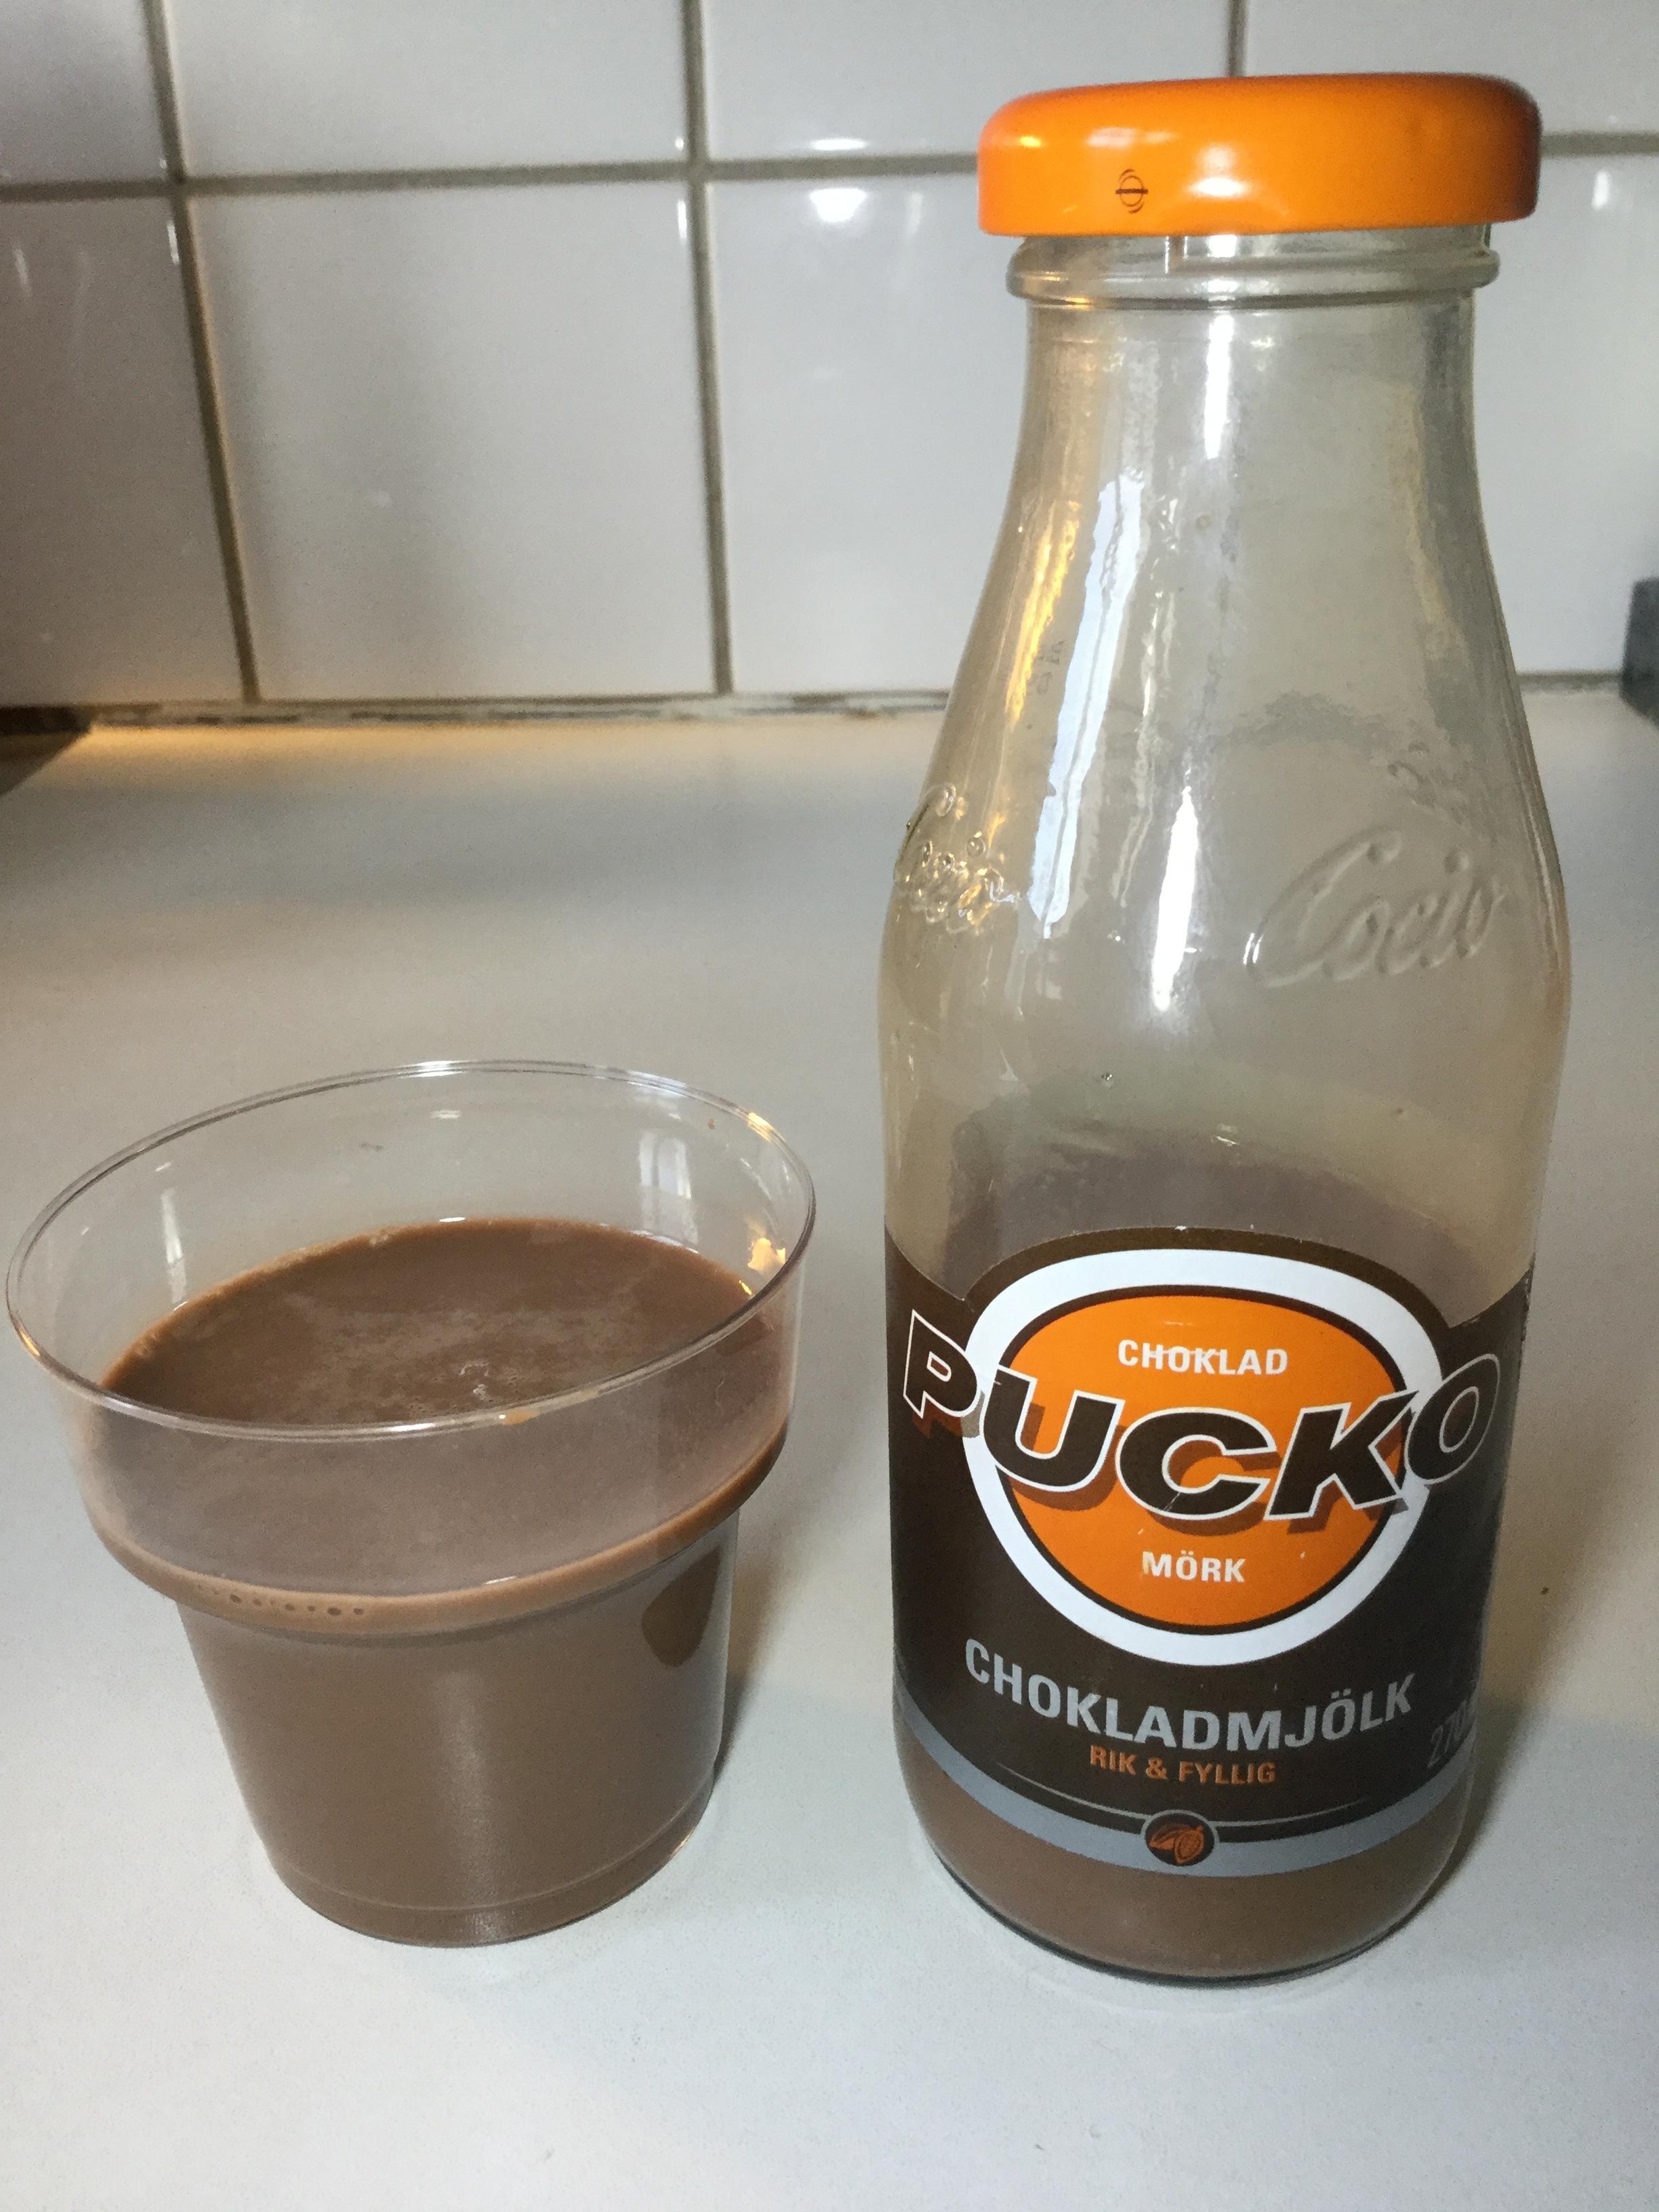 Pucko Dark Chokladmjölk Cup